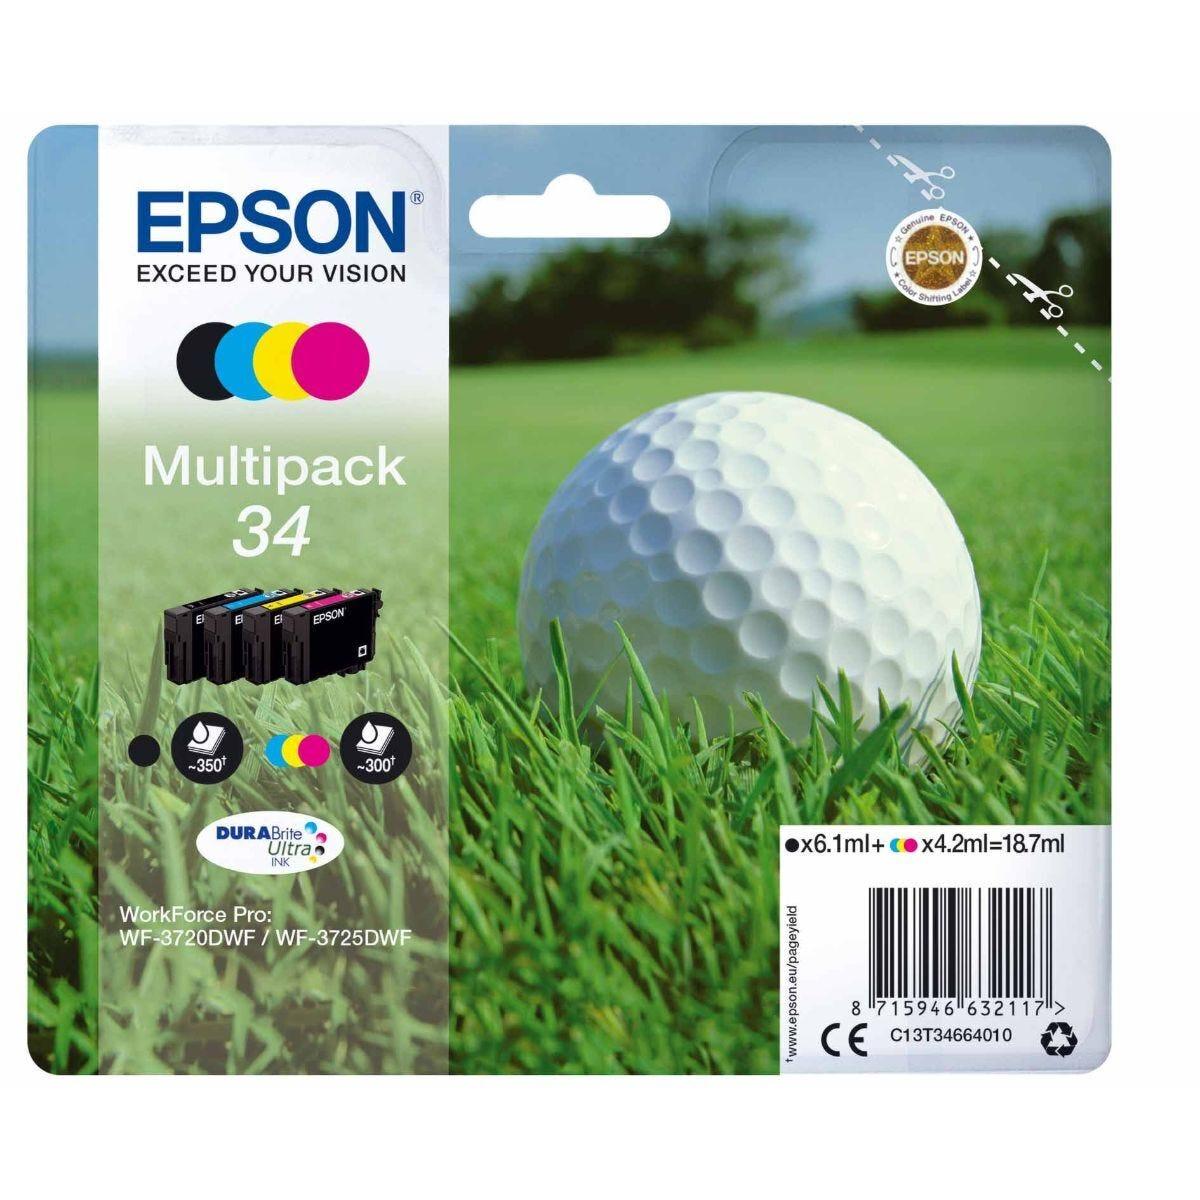 Epson 34 Workforce Pro Ink Multipack